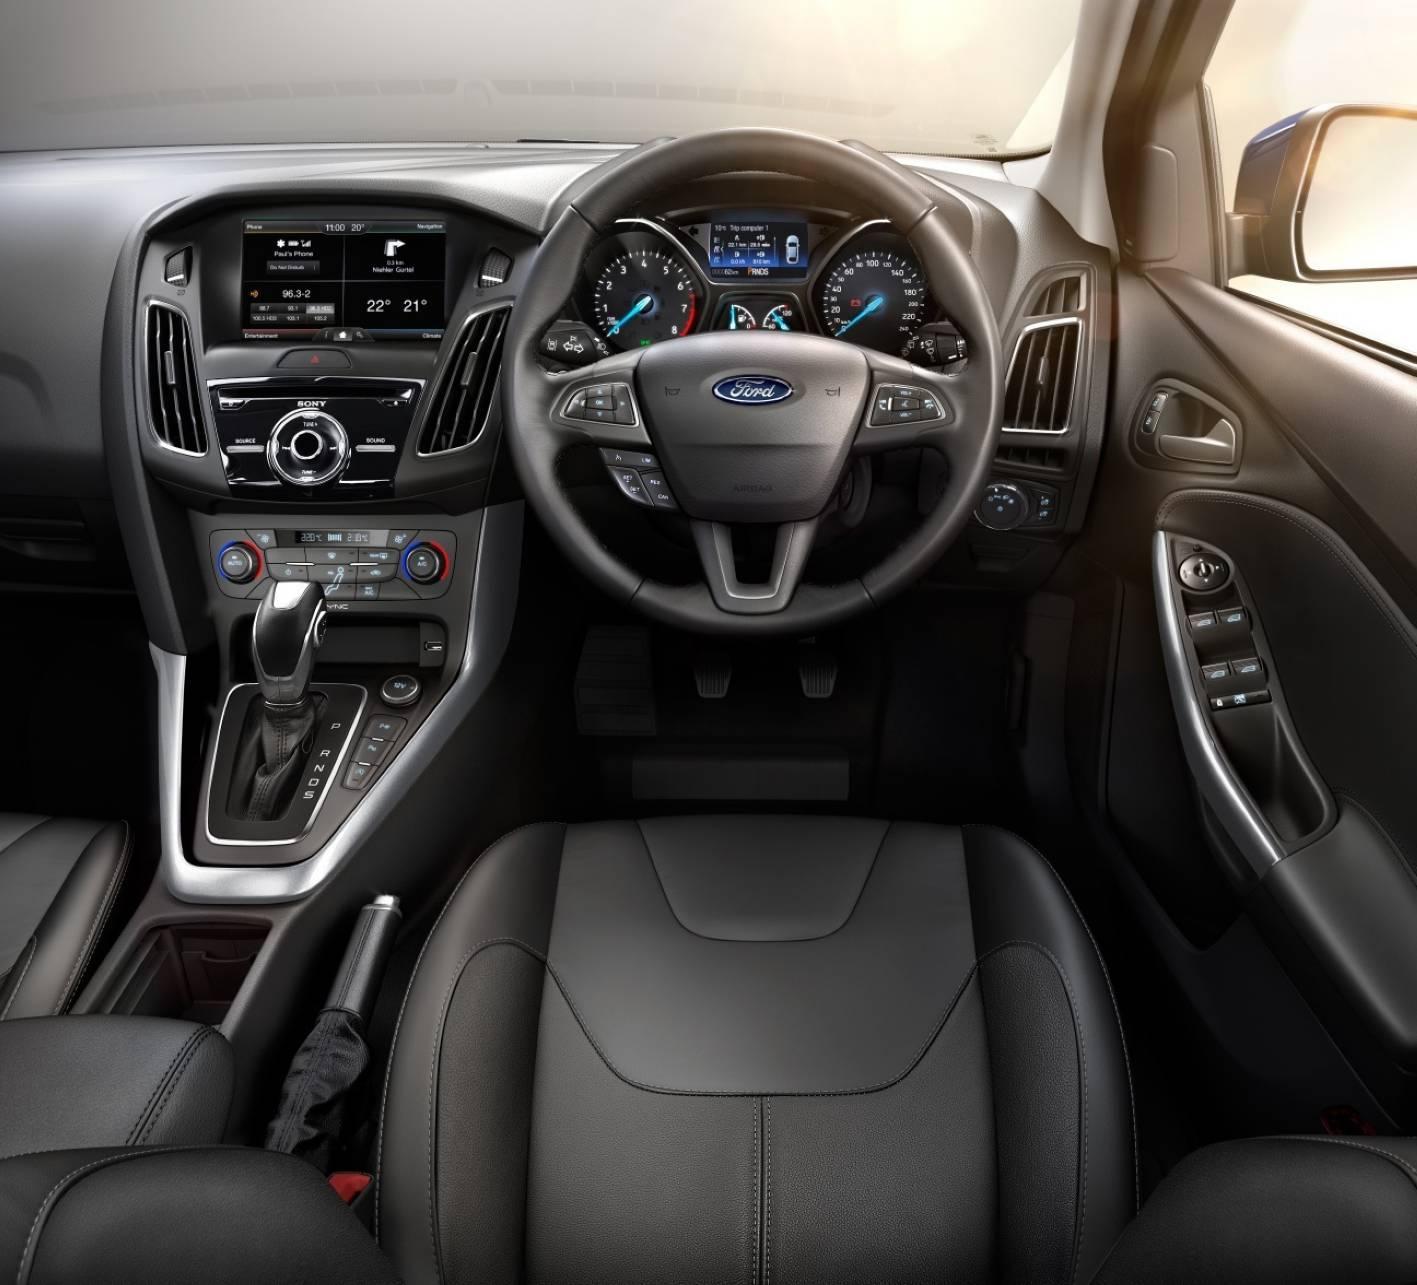 ford cars news 2015 focus gains 132kw 240nm 1 5l ecoboost. Black Bedroom Furniture Sets. Home Design Ideas